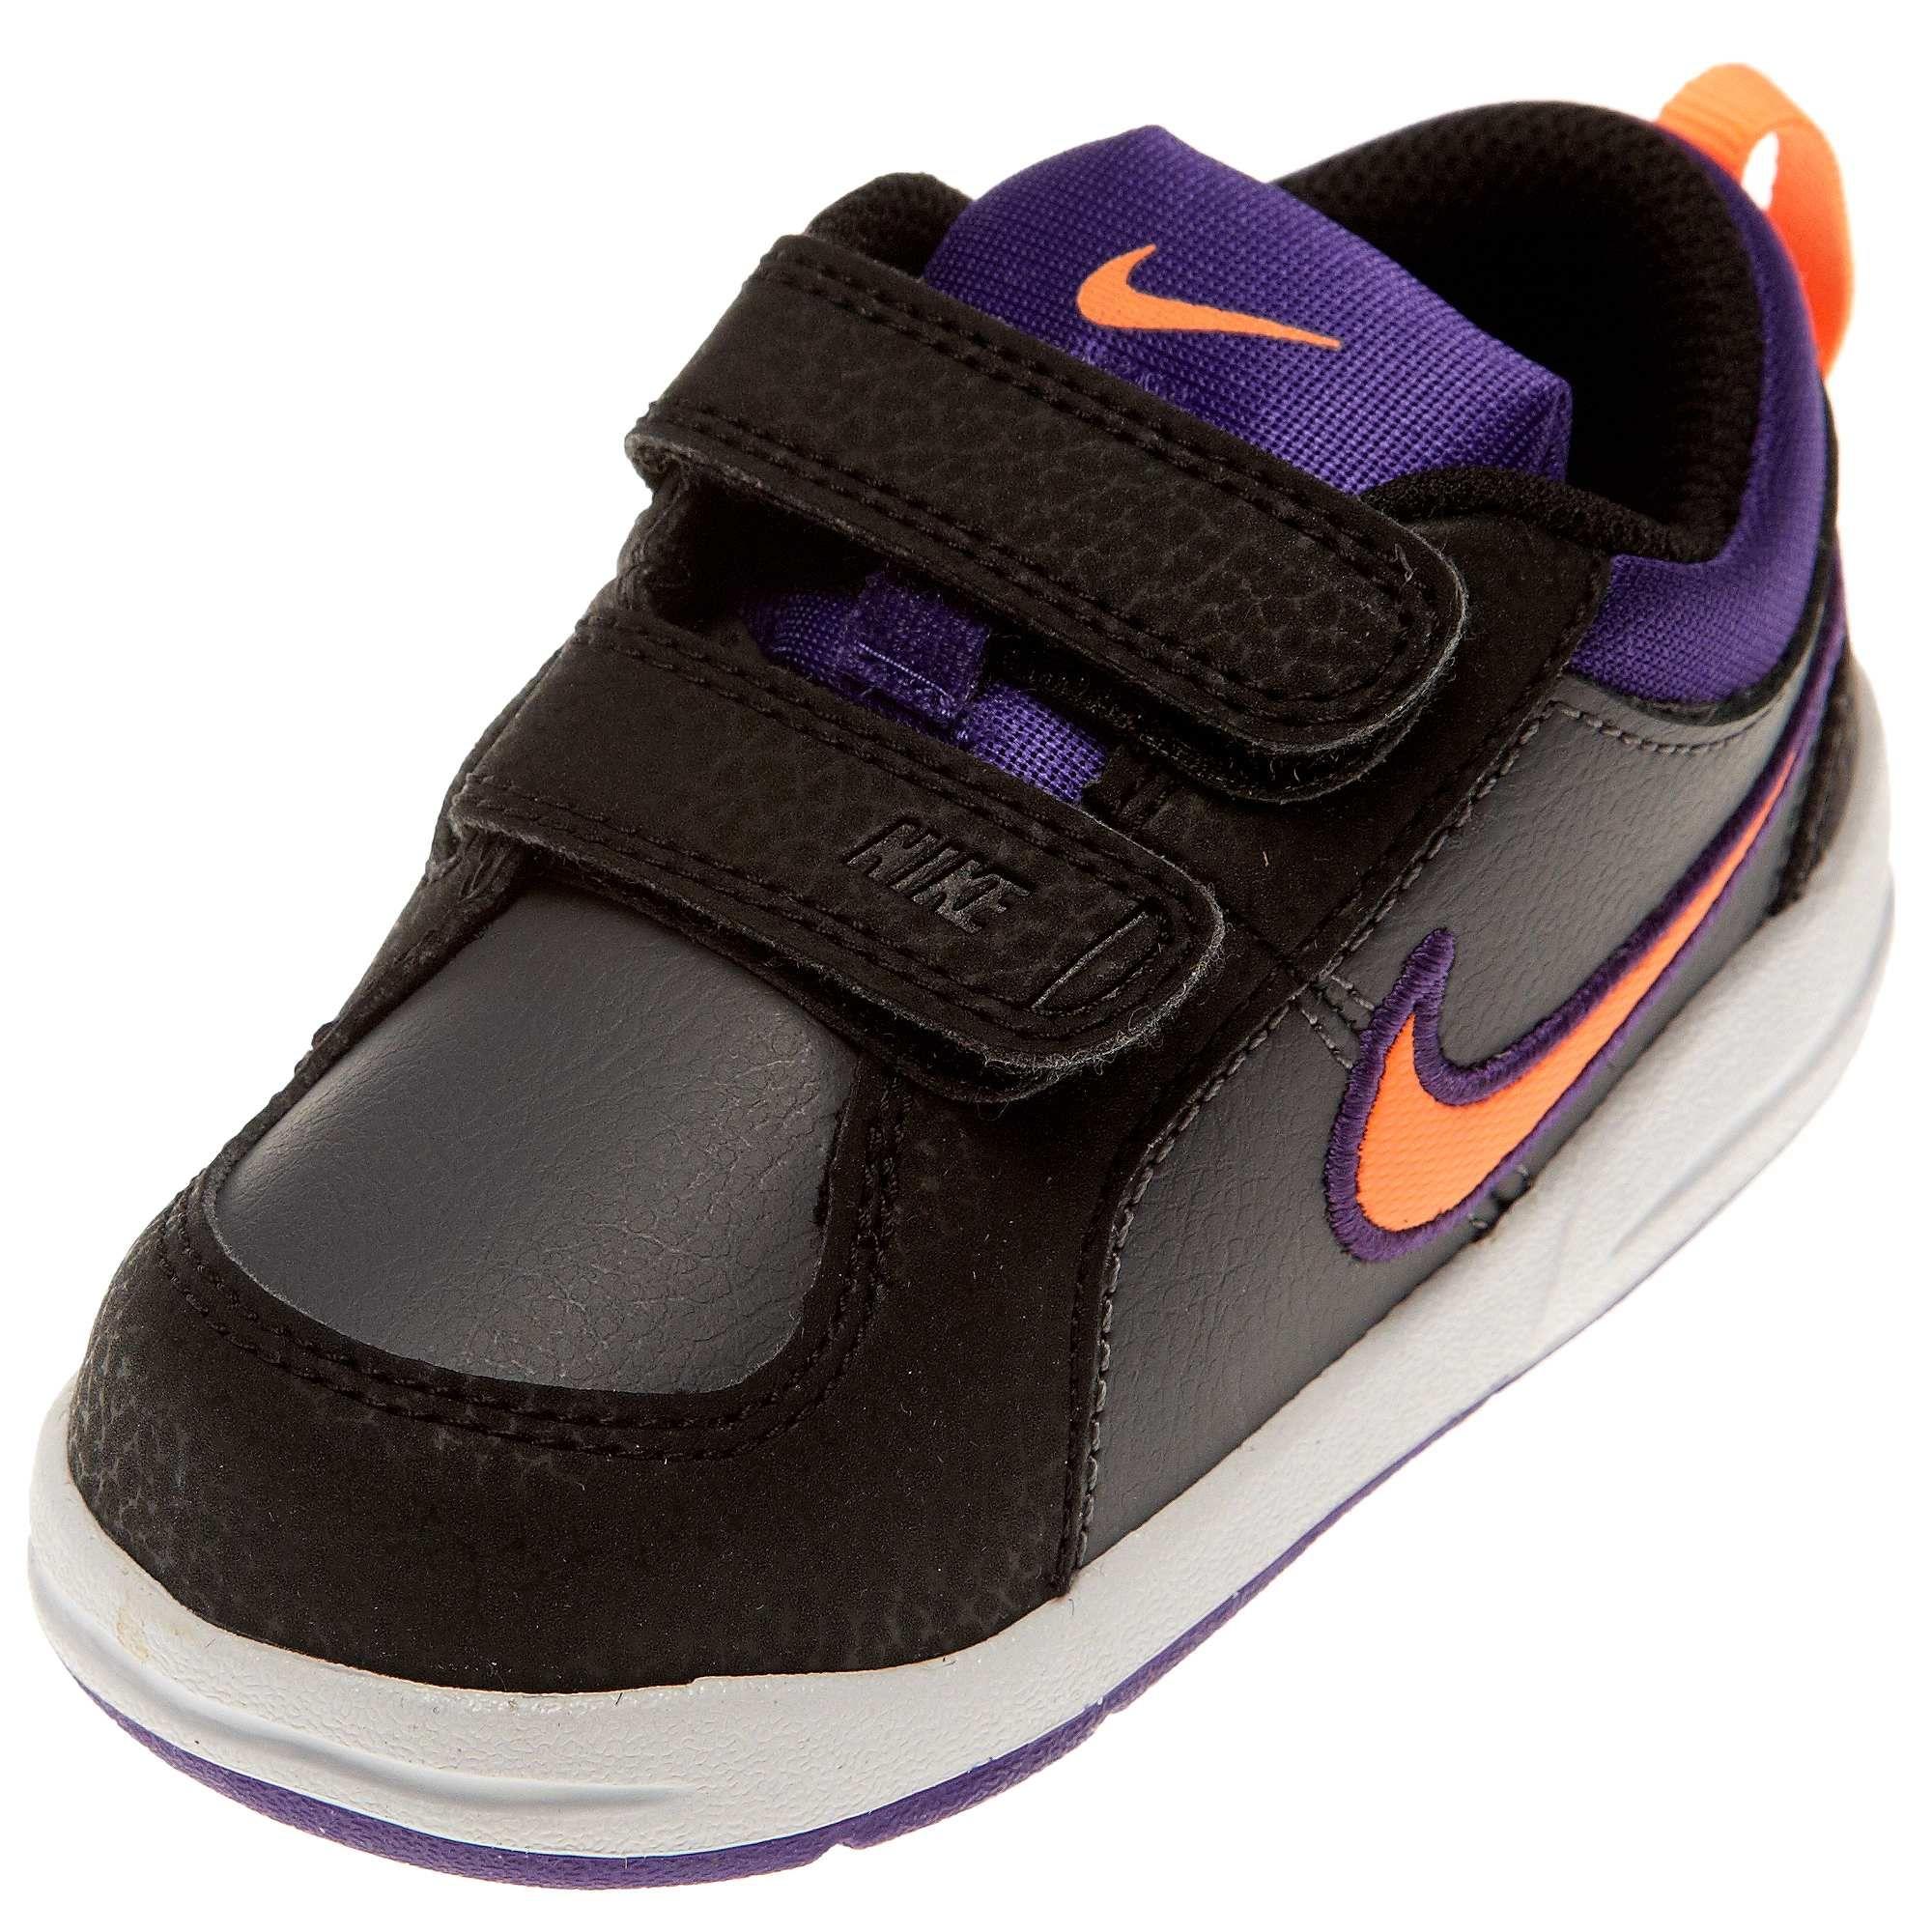 be0f24c562f Zapatillas deportivas 'Nike' con cierre autoadherente Infantil niño - Kiabi  -